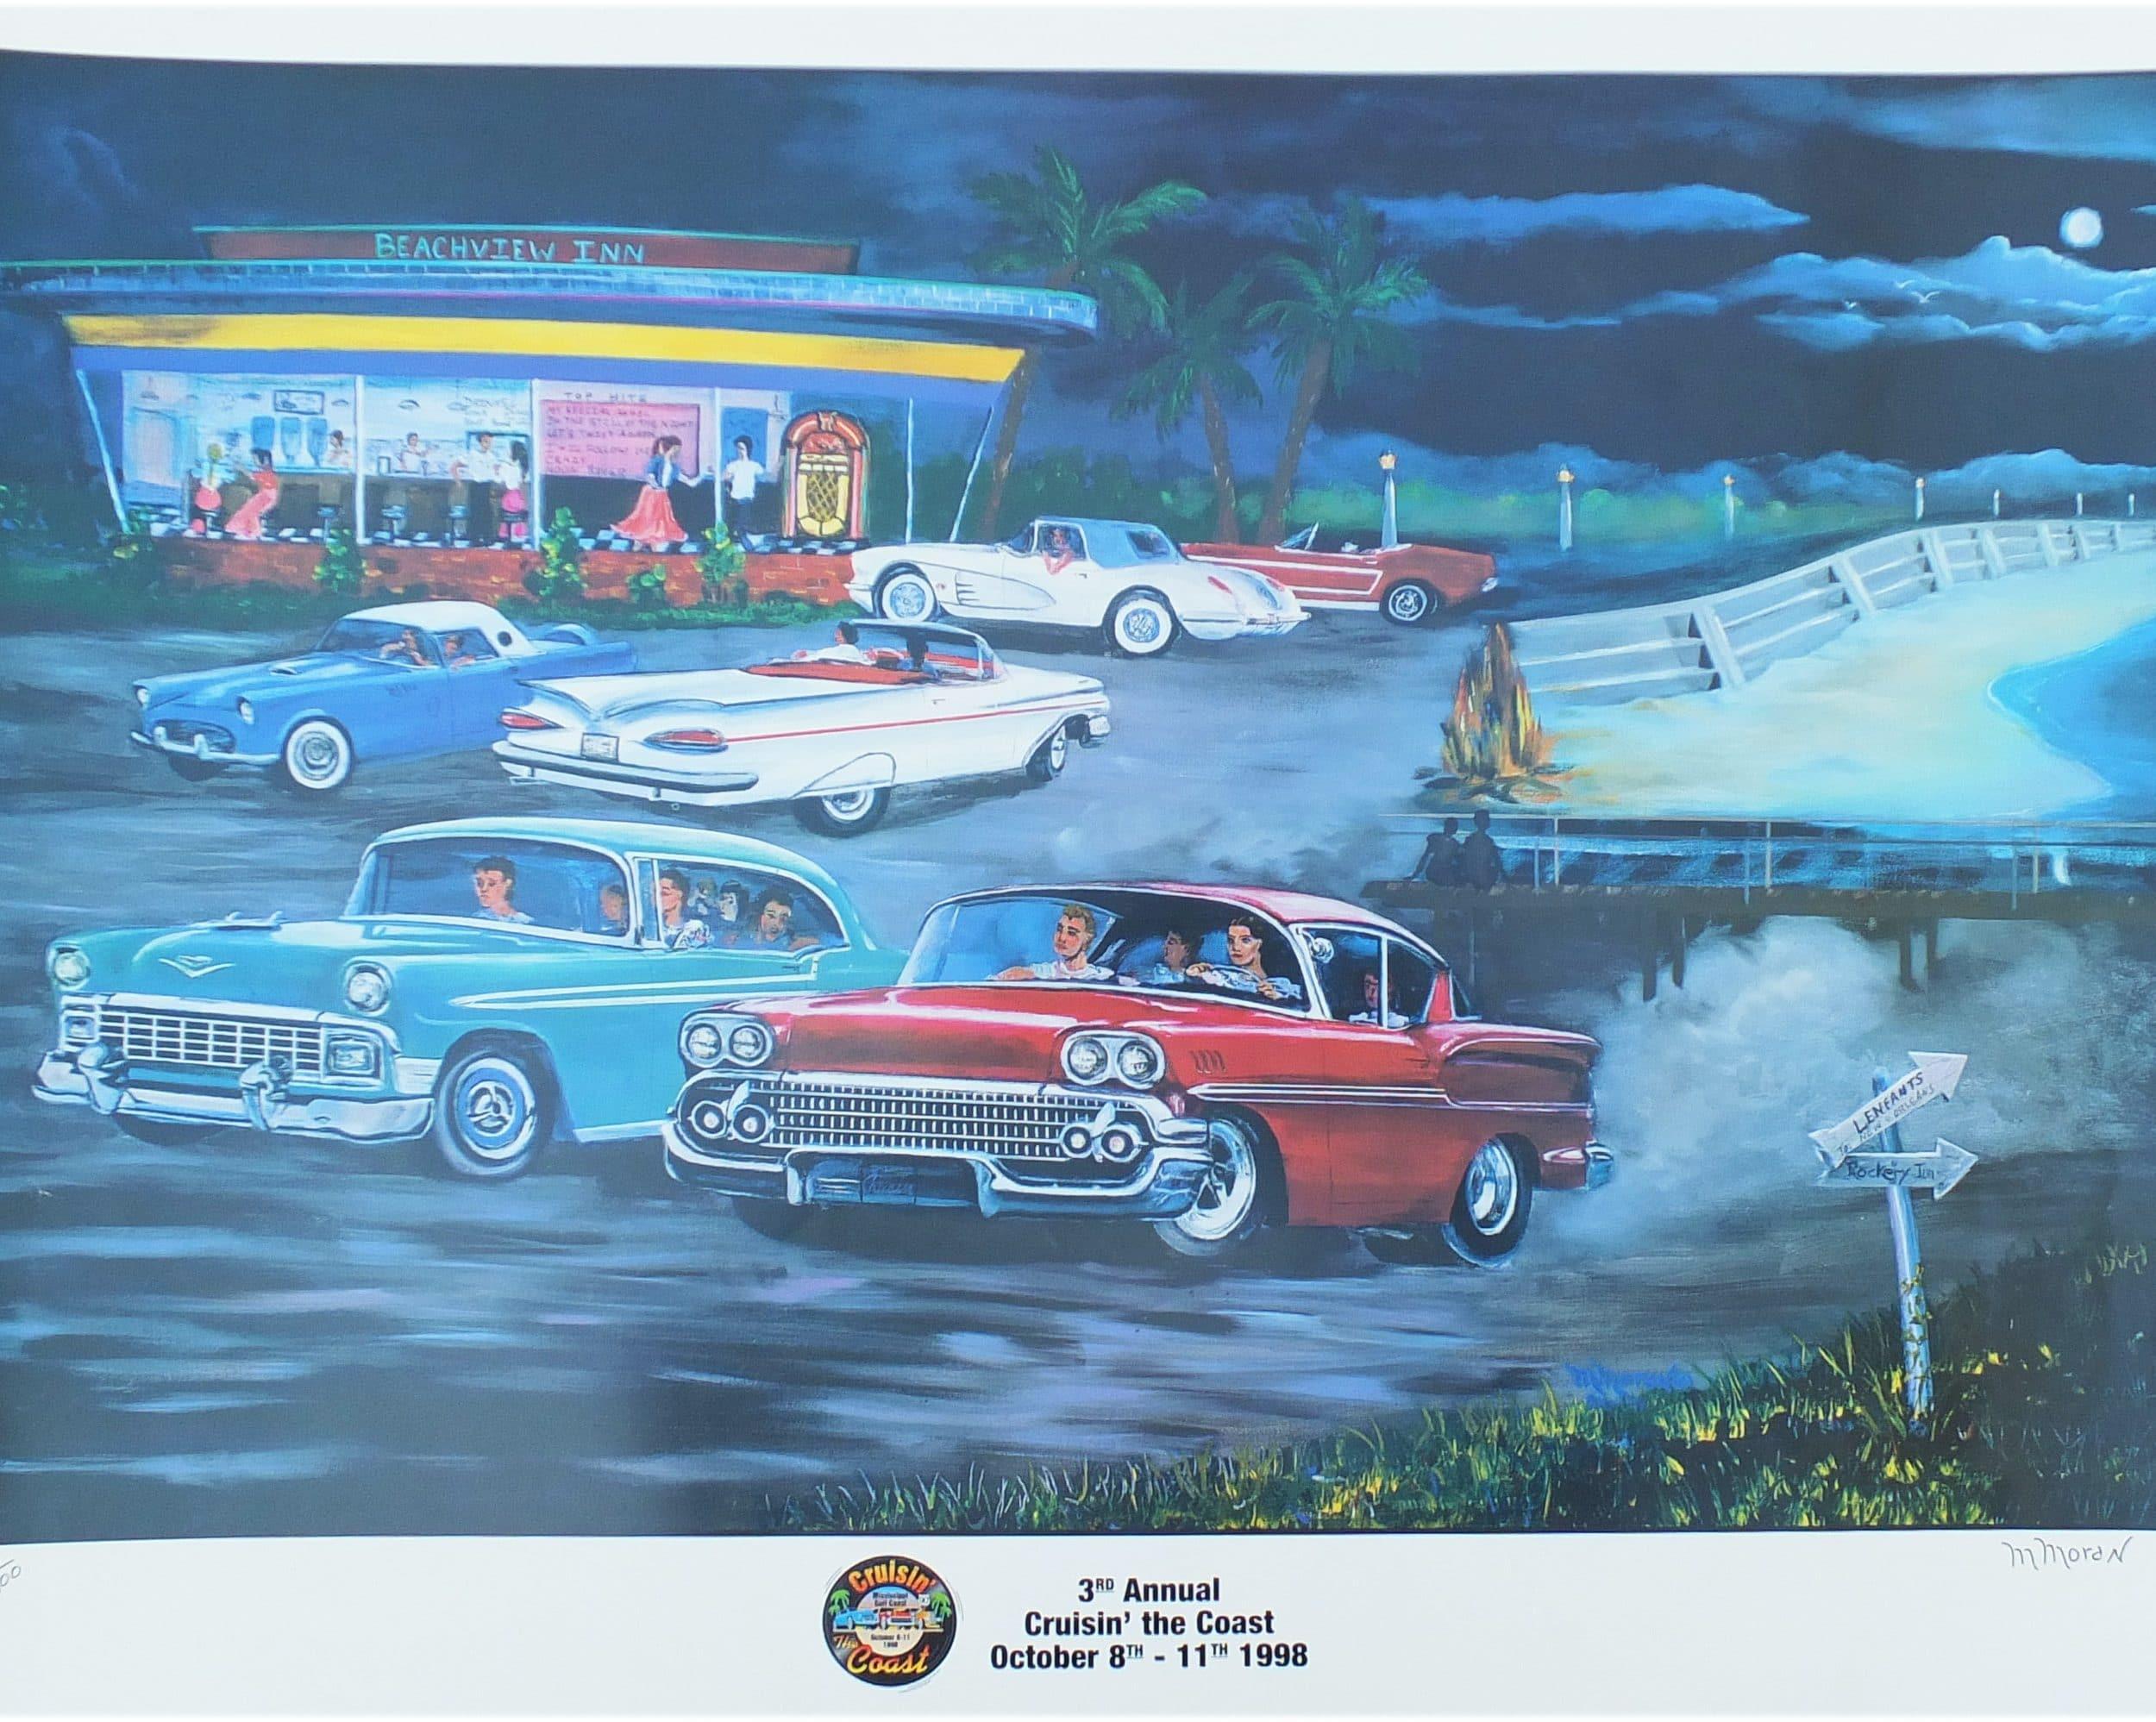 Cruisin' the Coast poster 1998 by M Moran